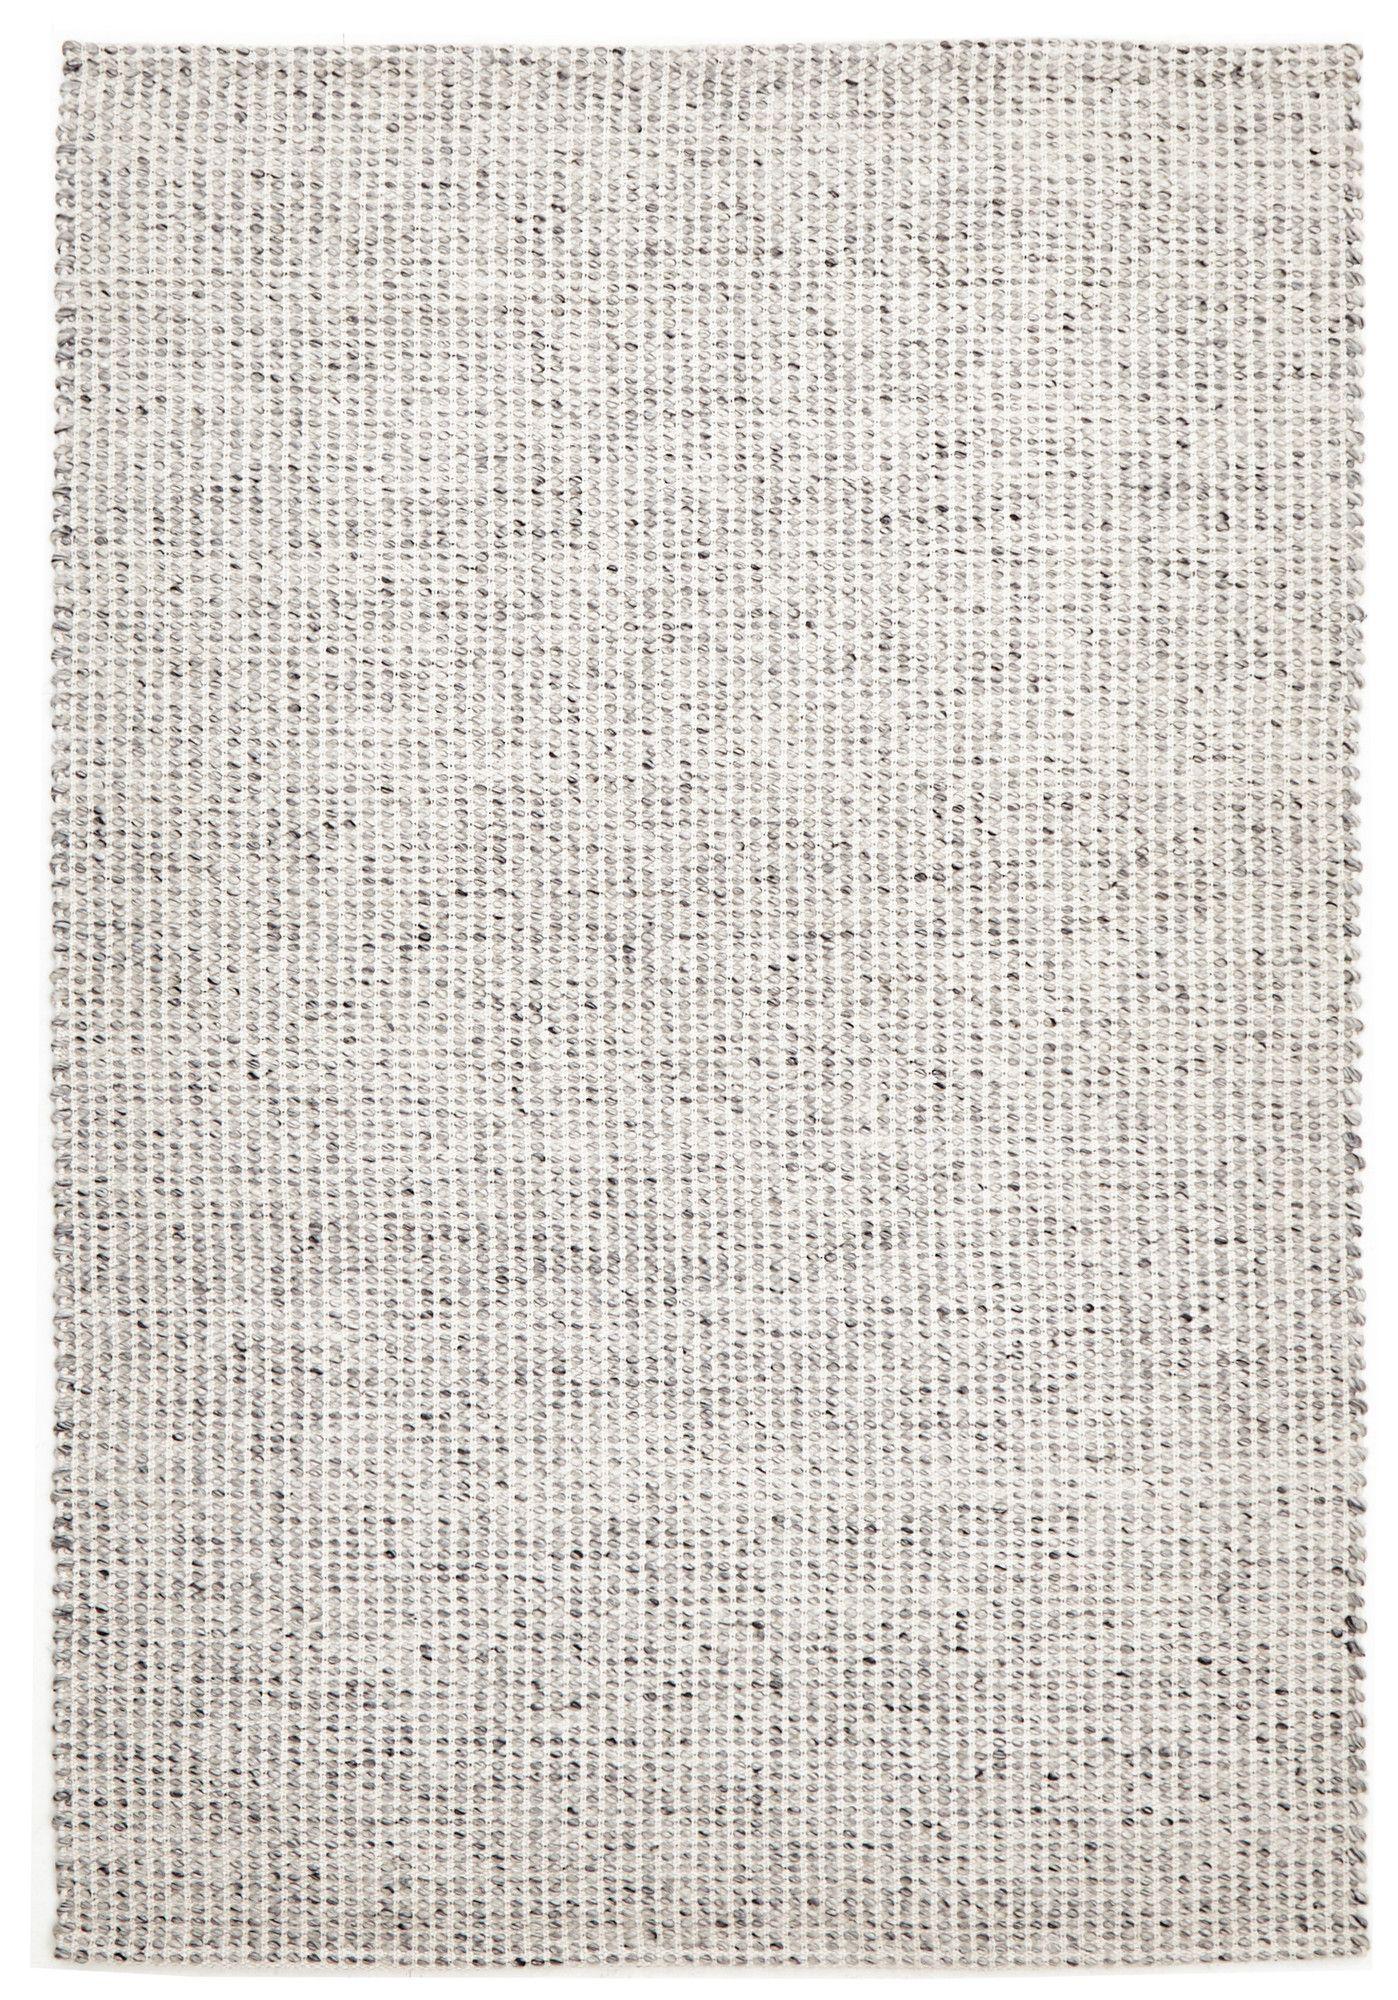 Flat Weave Rugs Australia